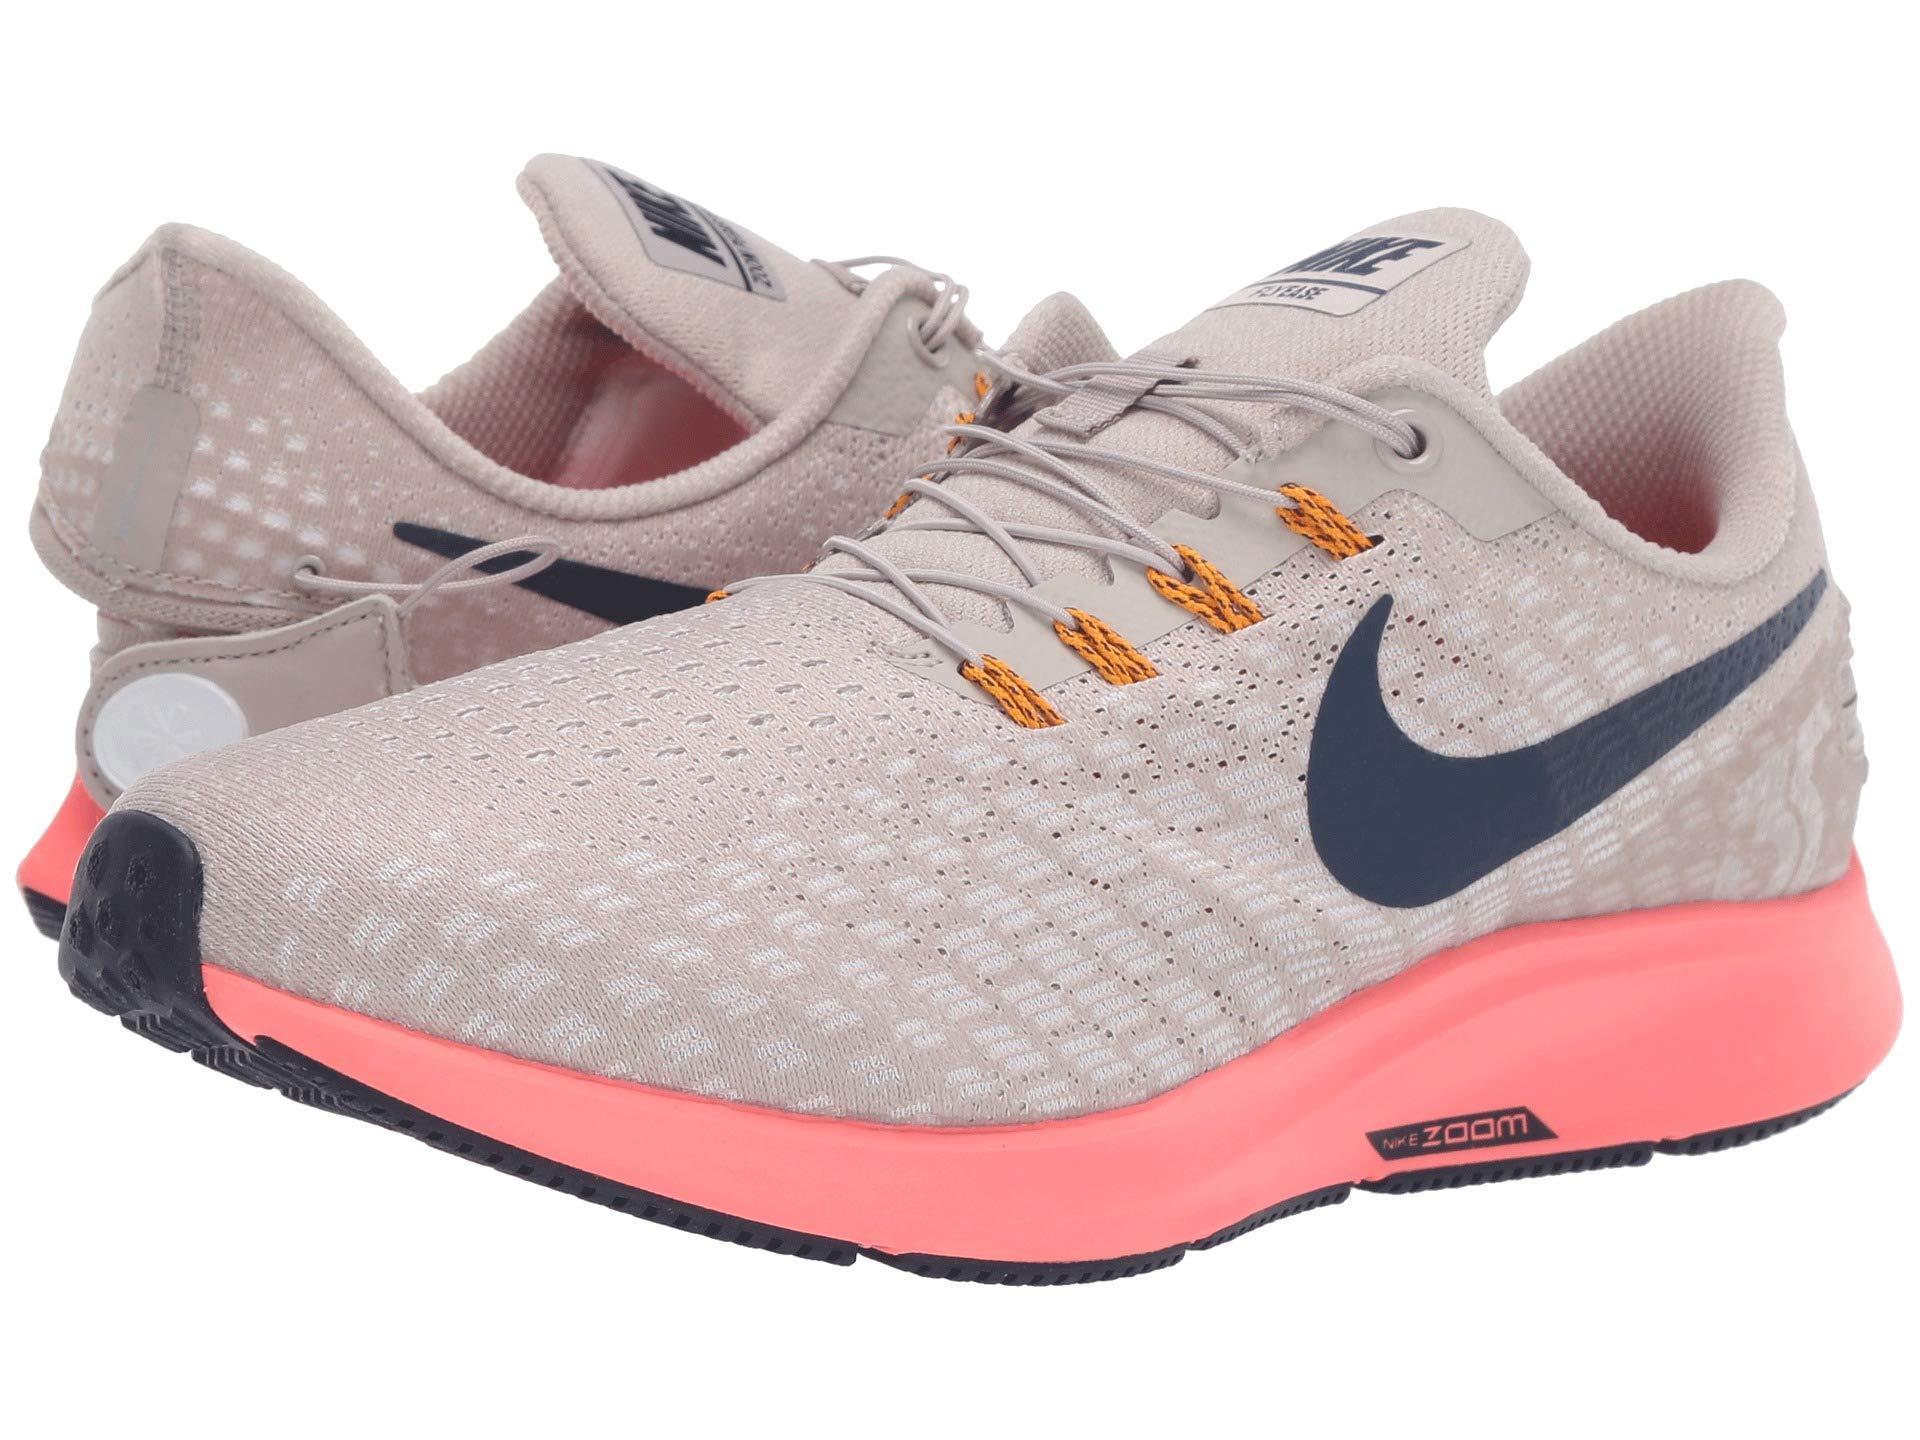 717ebe962e12 Lyst - Nike Air Zoom Pegasus 35 Running Shoe for Men - Save 5%